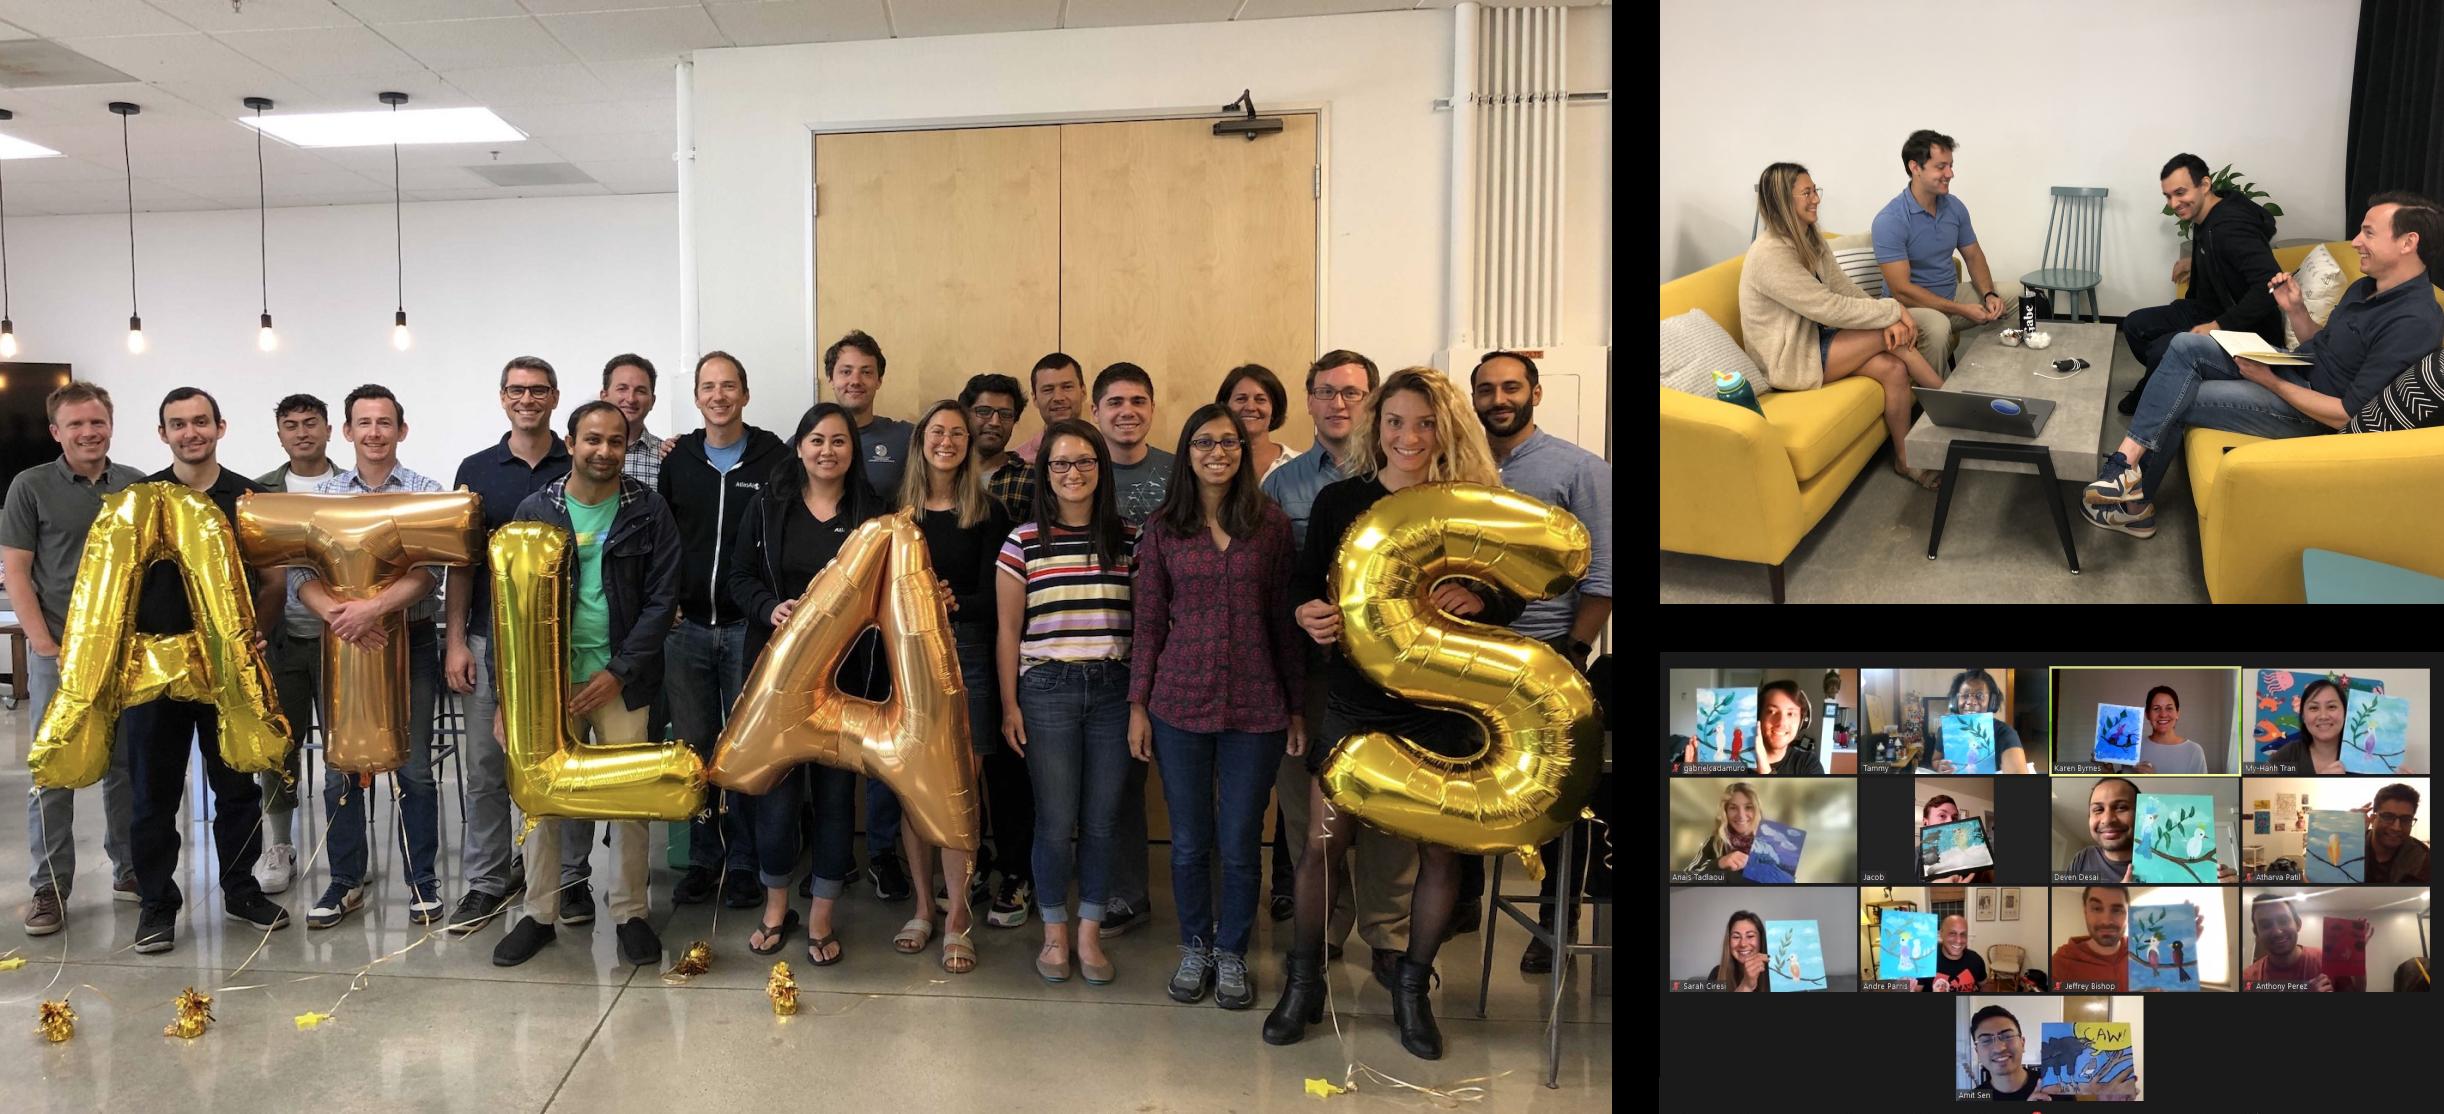 Atlas AI team offsite group images